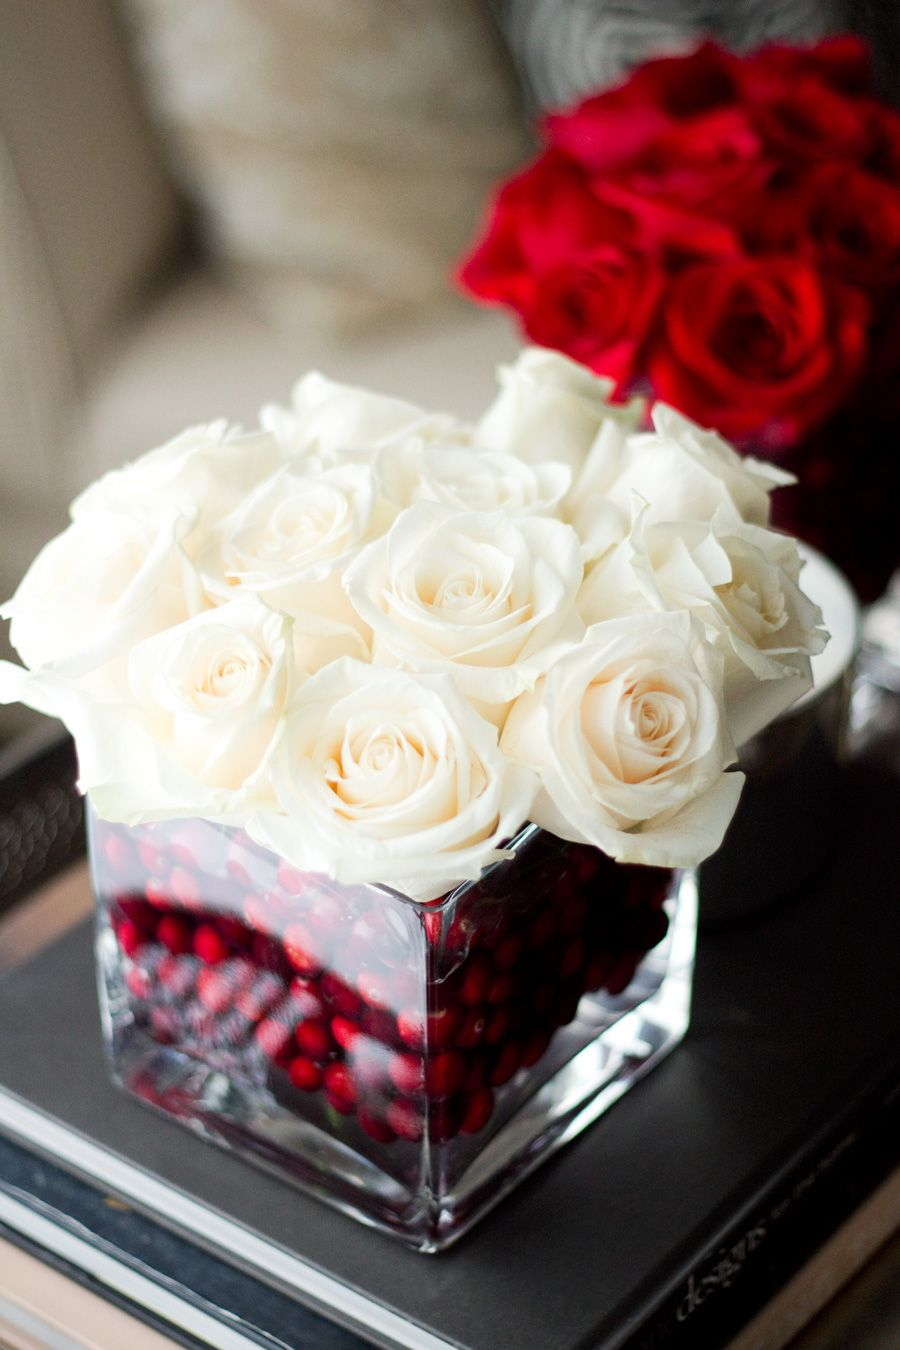 Roses d'hiver